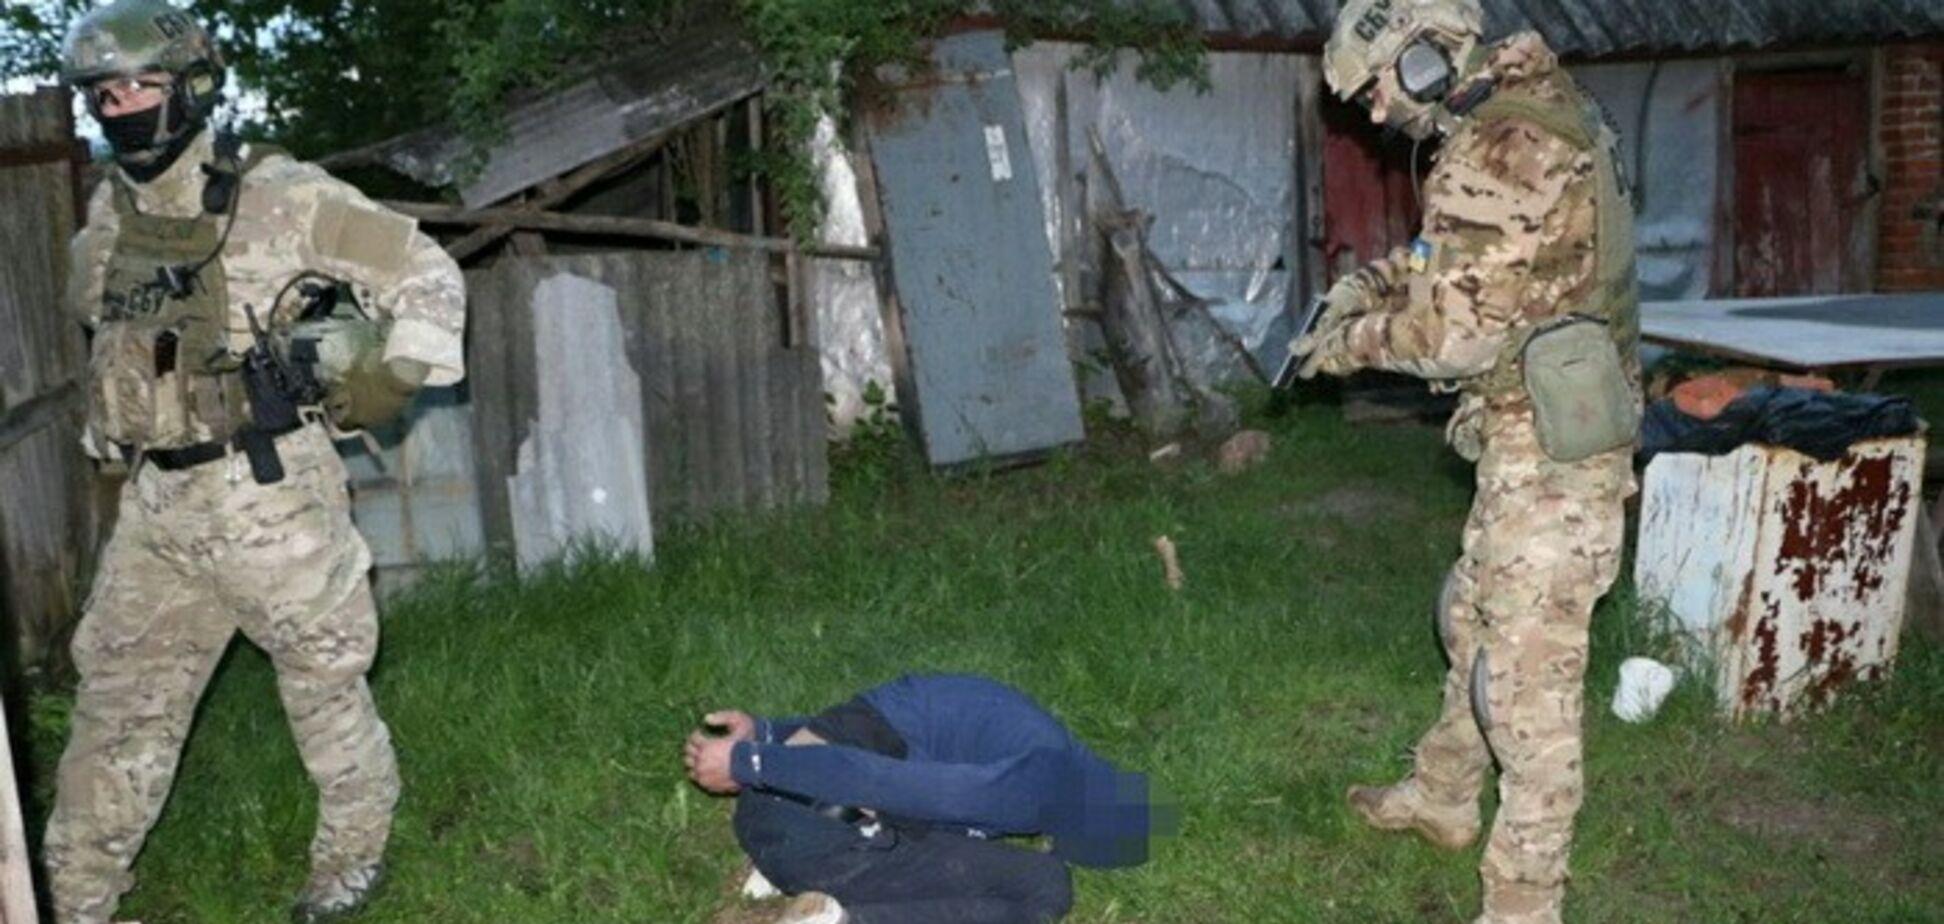 Був проти Кремля: СБУ не дала спецслужбам РФ викрасти росіянина з України